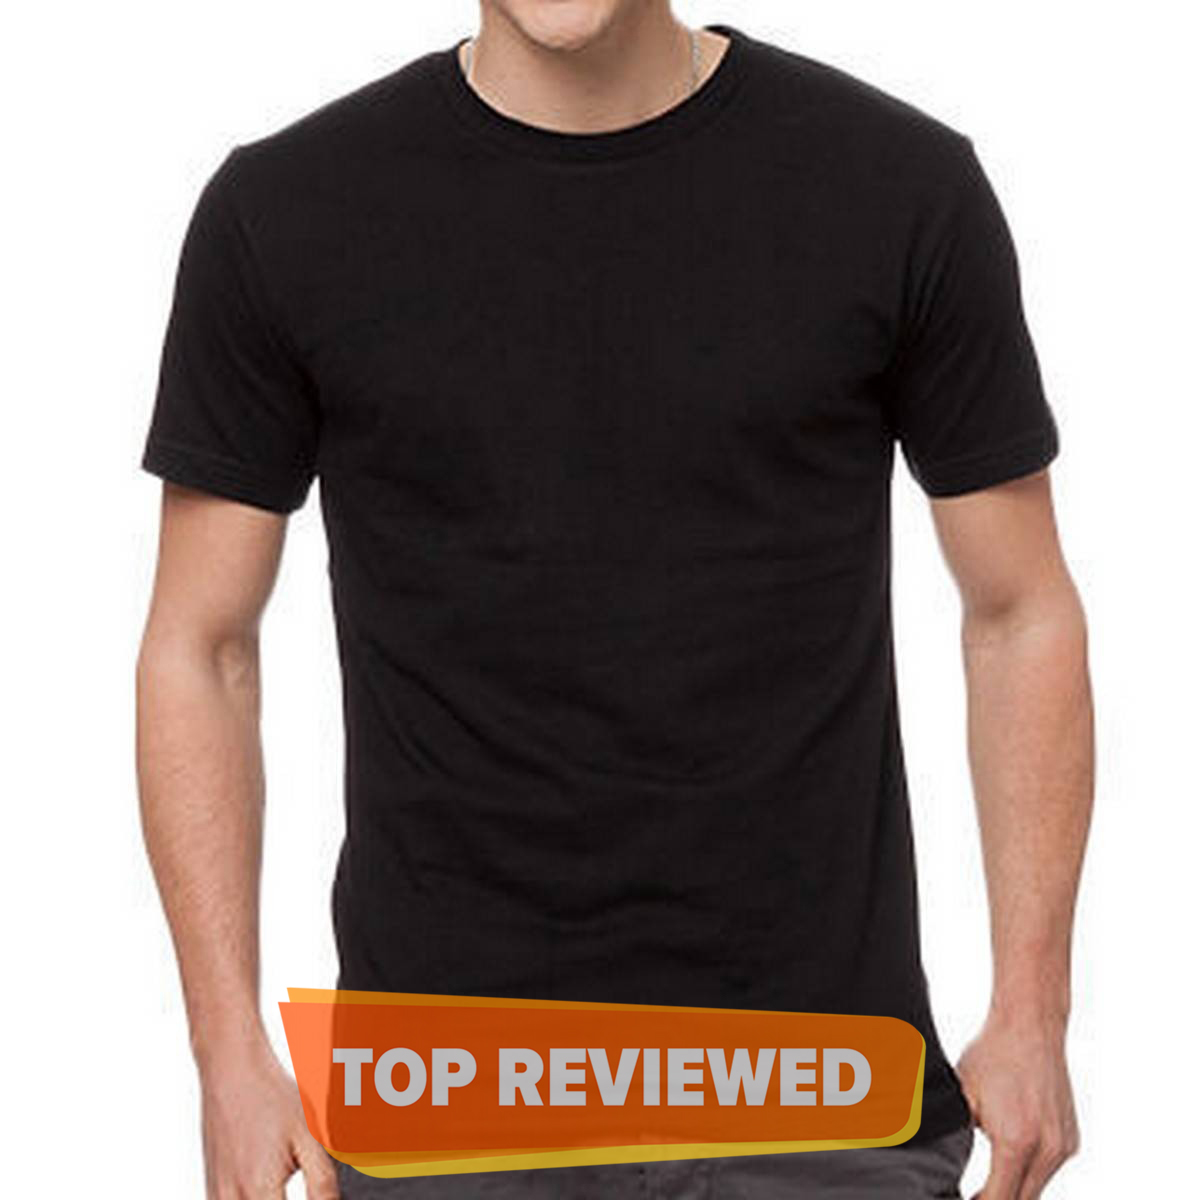 The Vintage Clothing Black basic premium T shirt